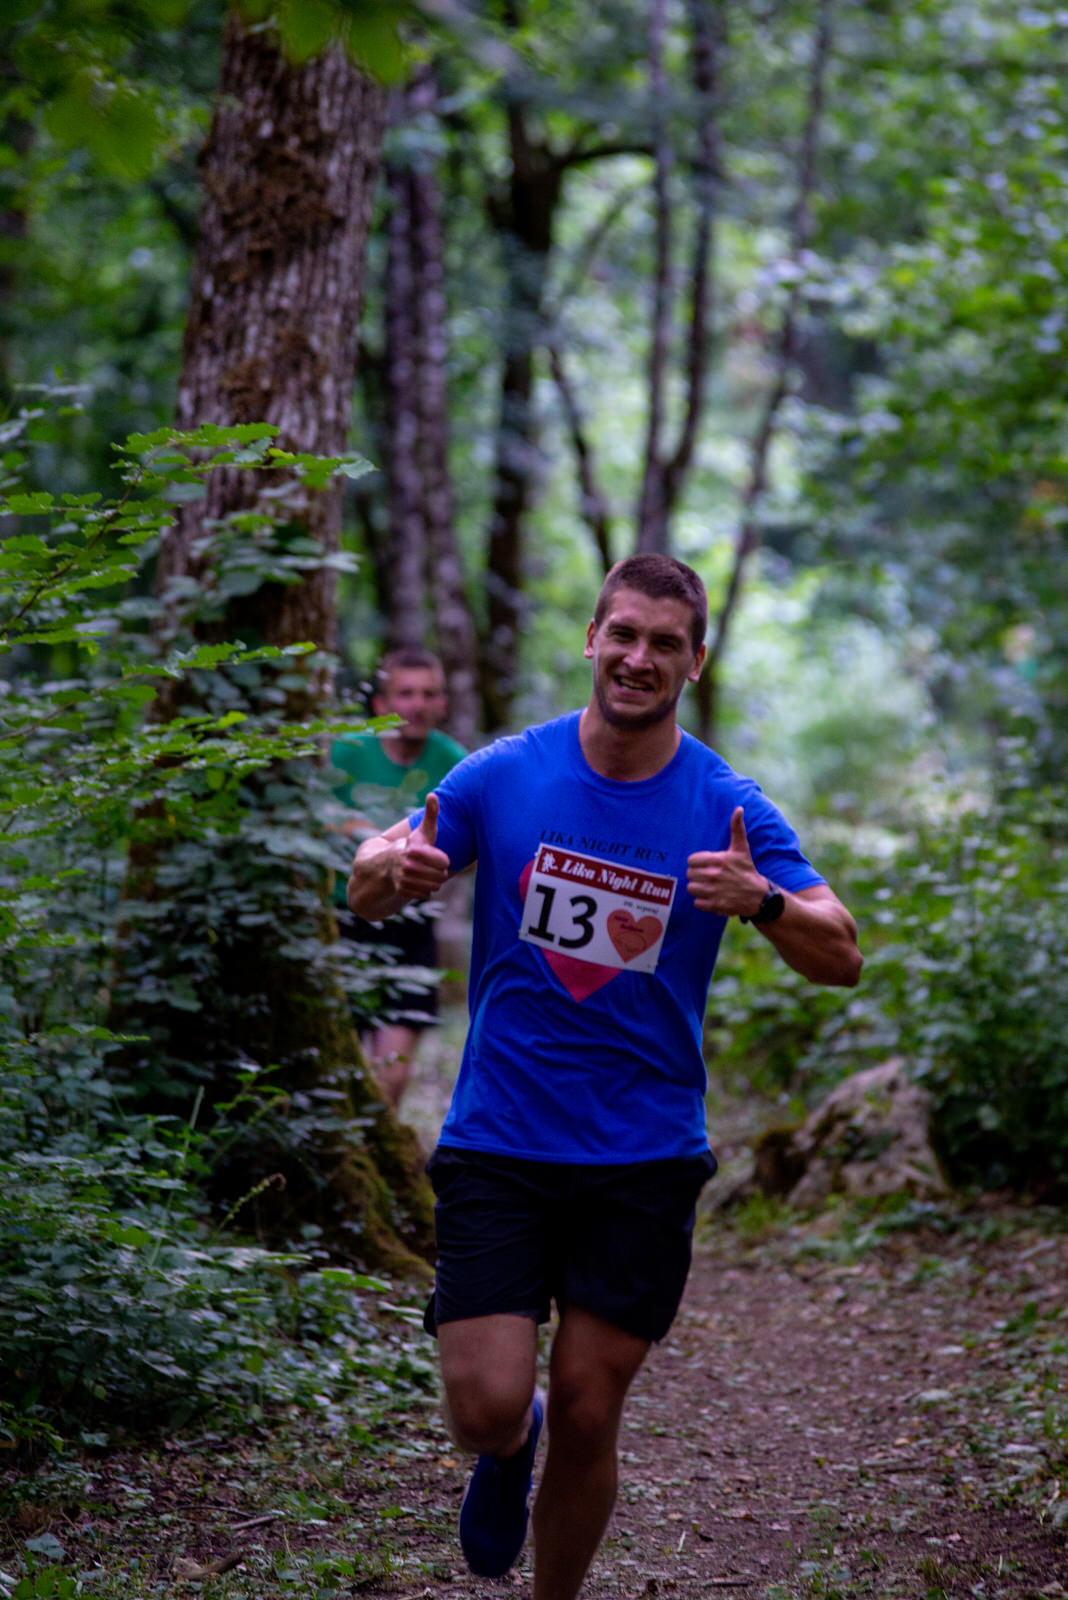 likaclub_lika night run_jasikovac_7_2020 (13)